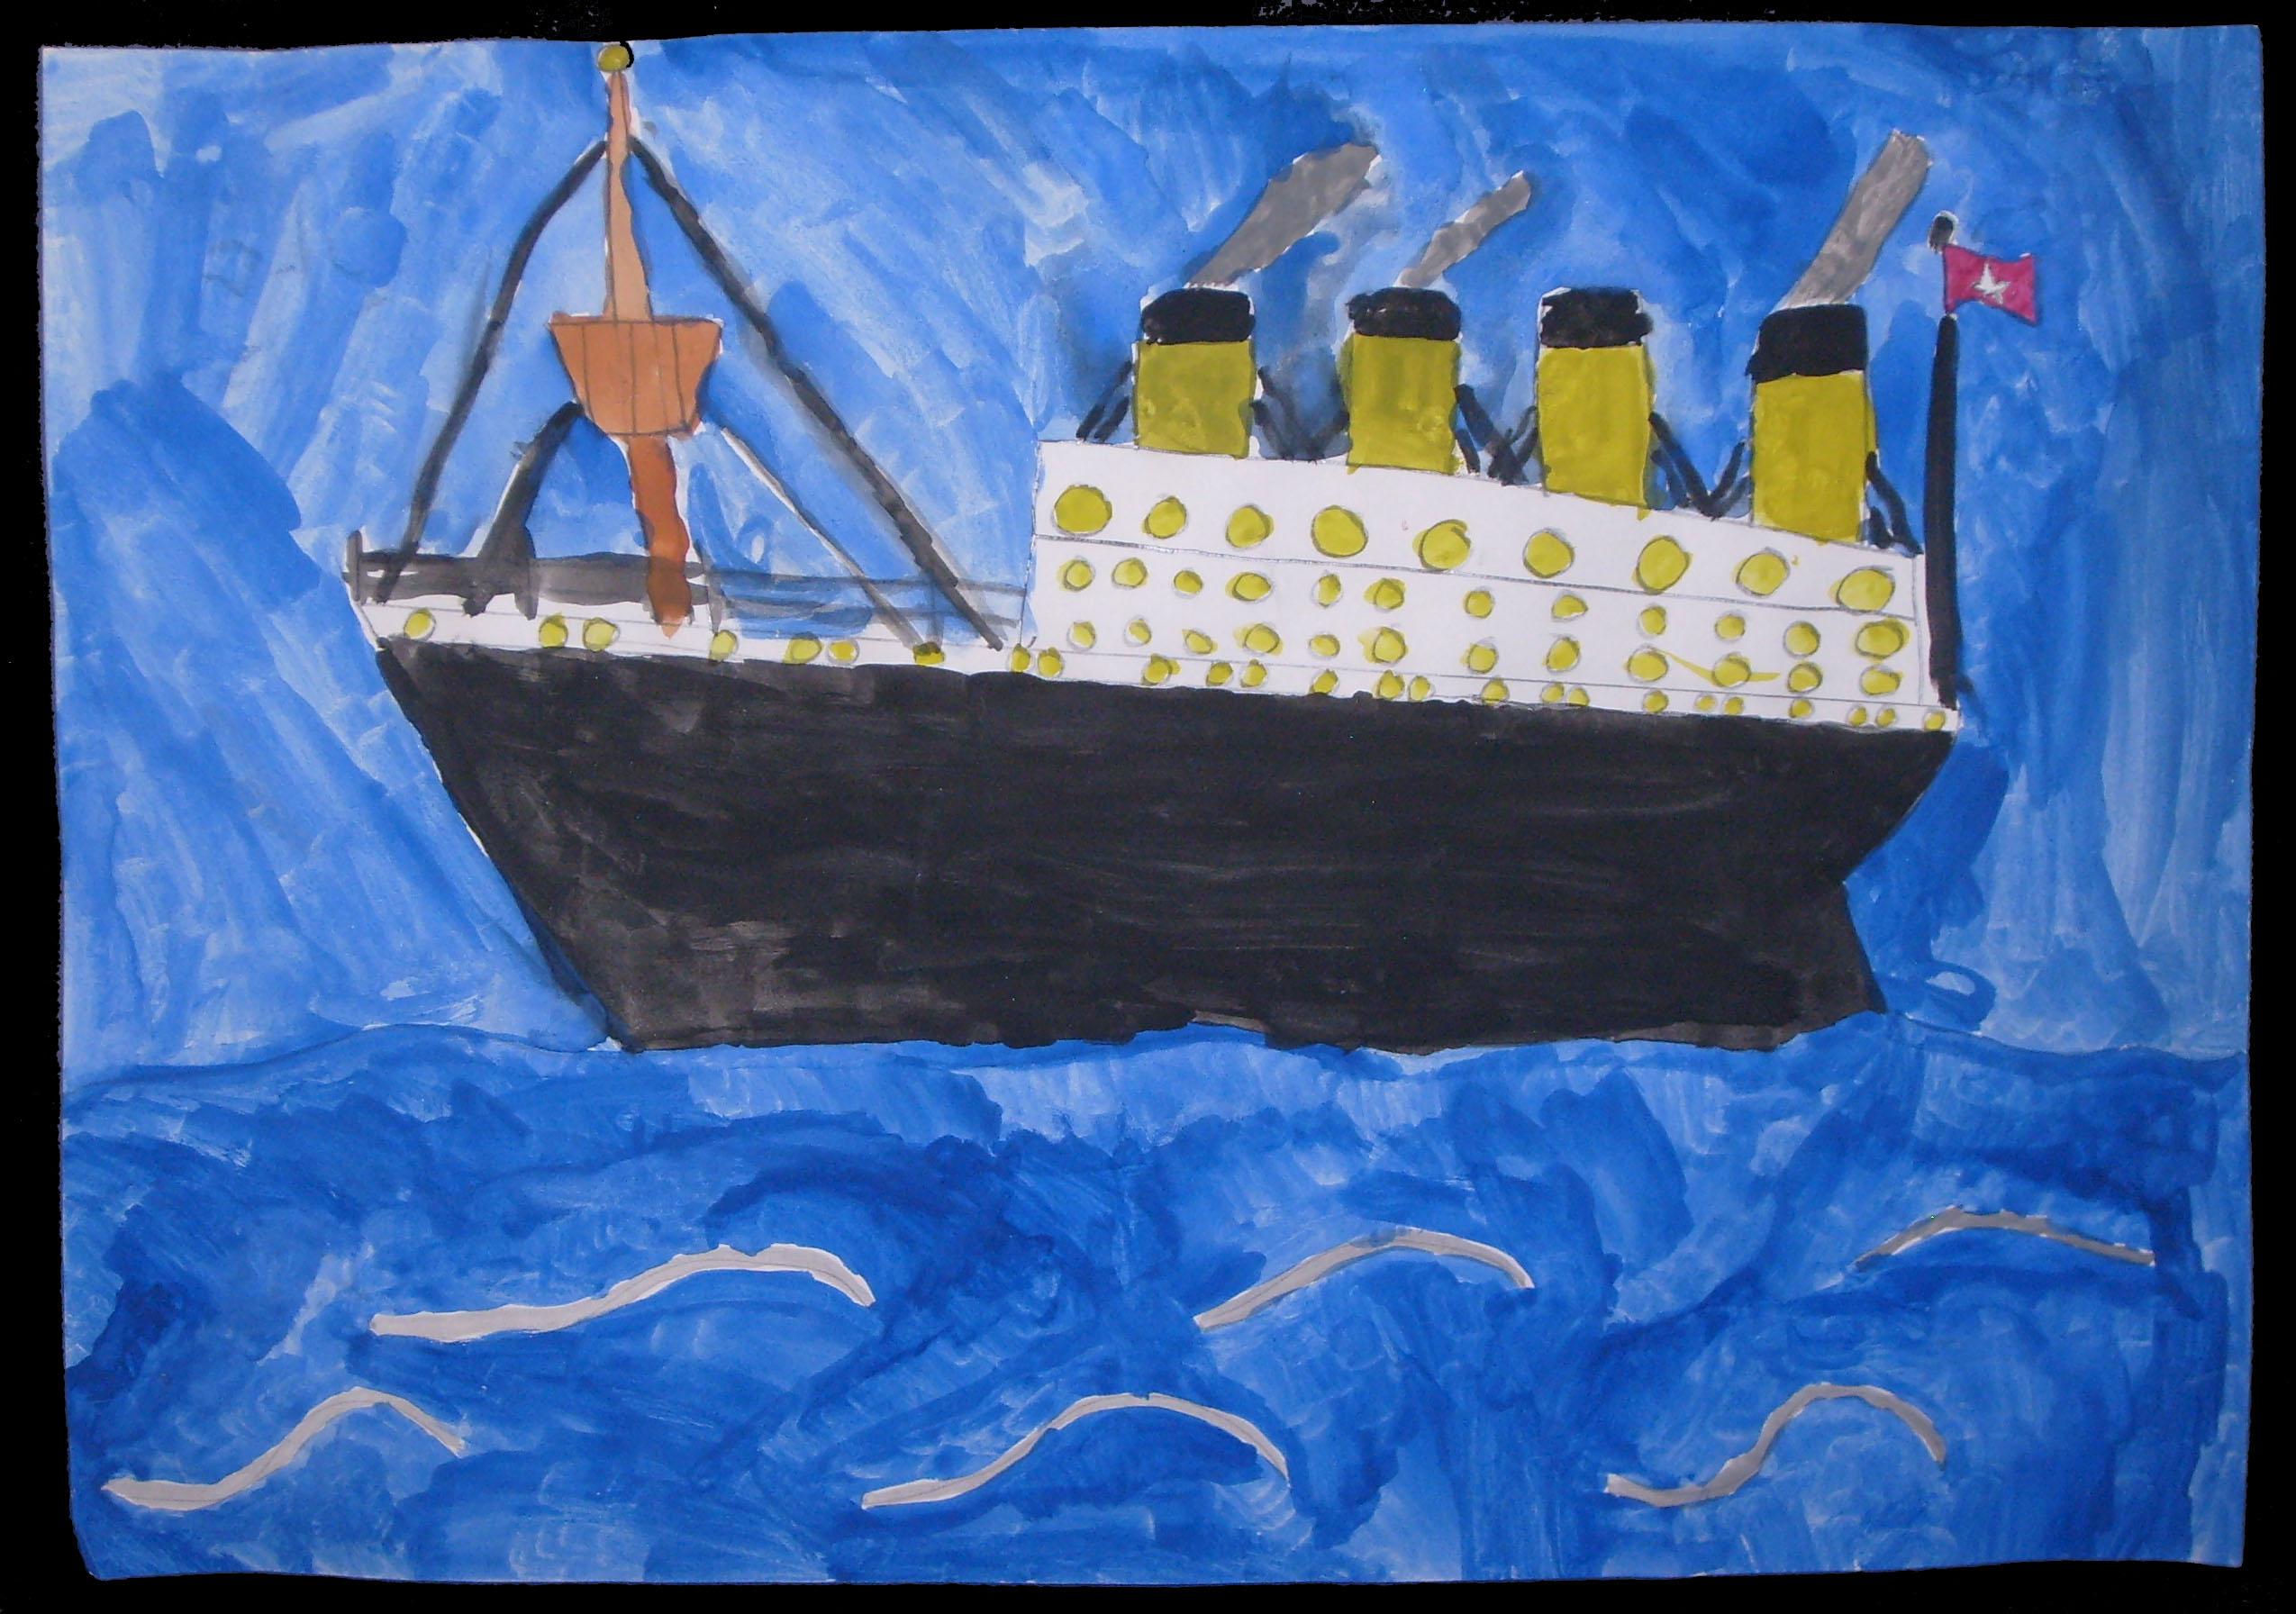 32fb9a9d Titanic Art Activity For Kids!